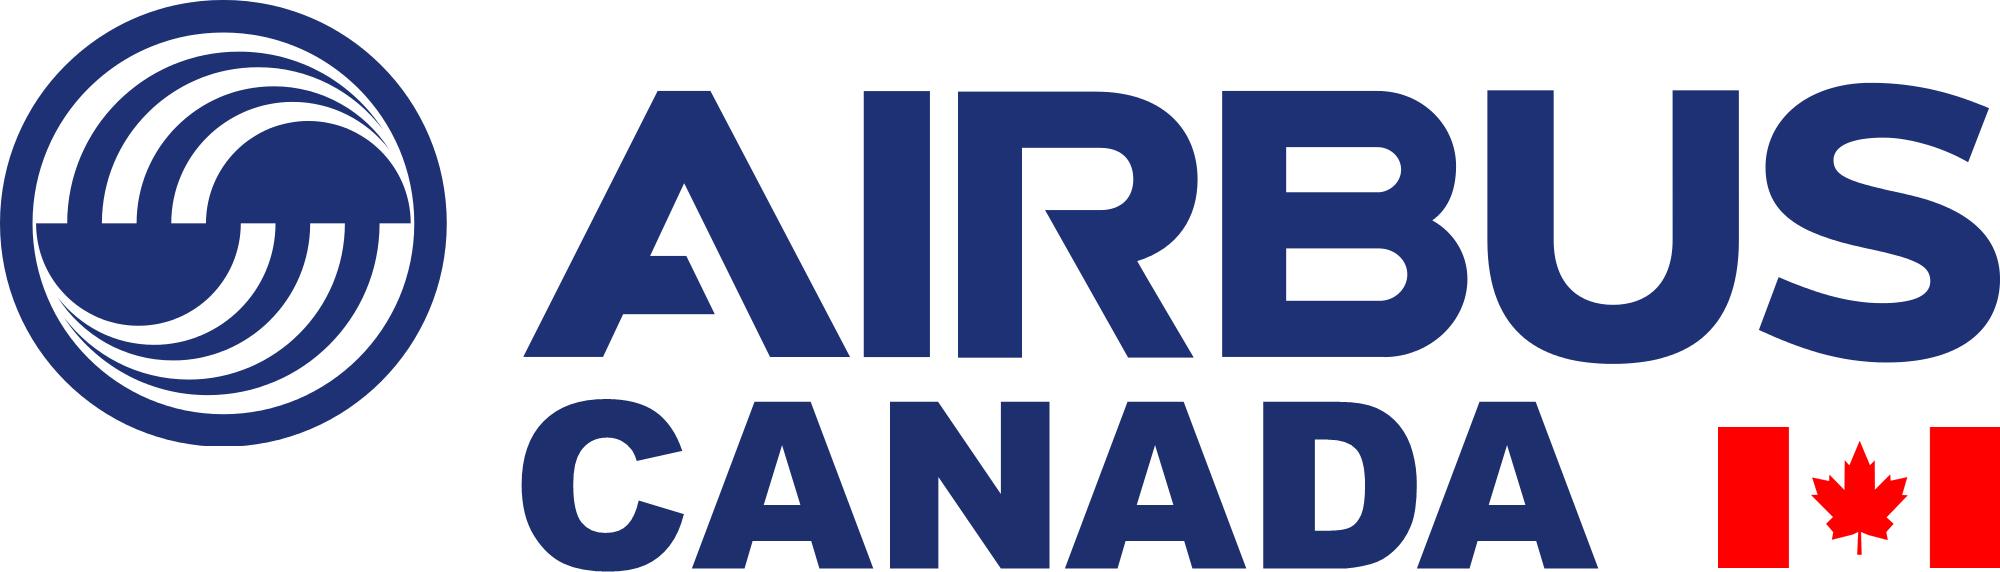 Airbus Canada_Isologotype